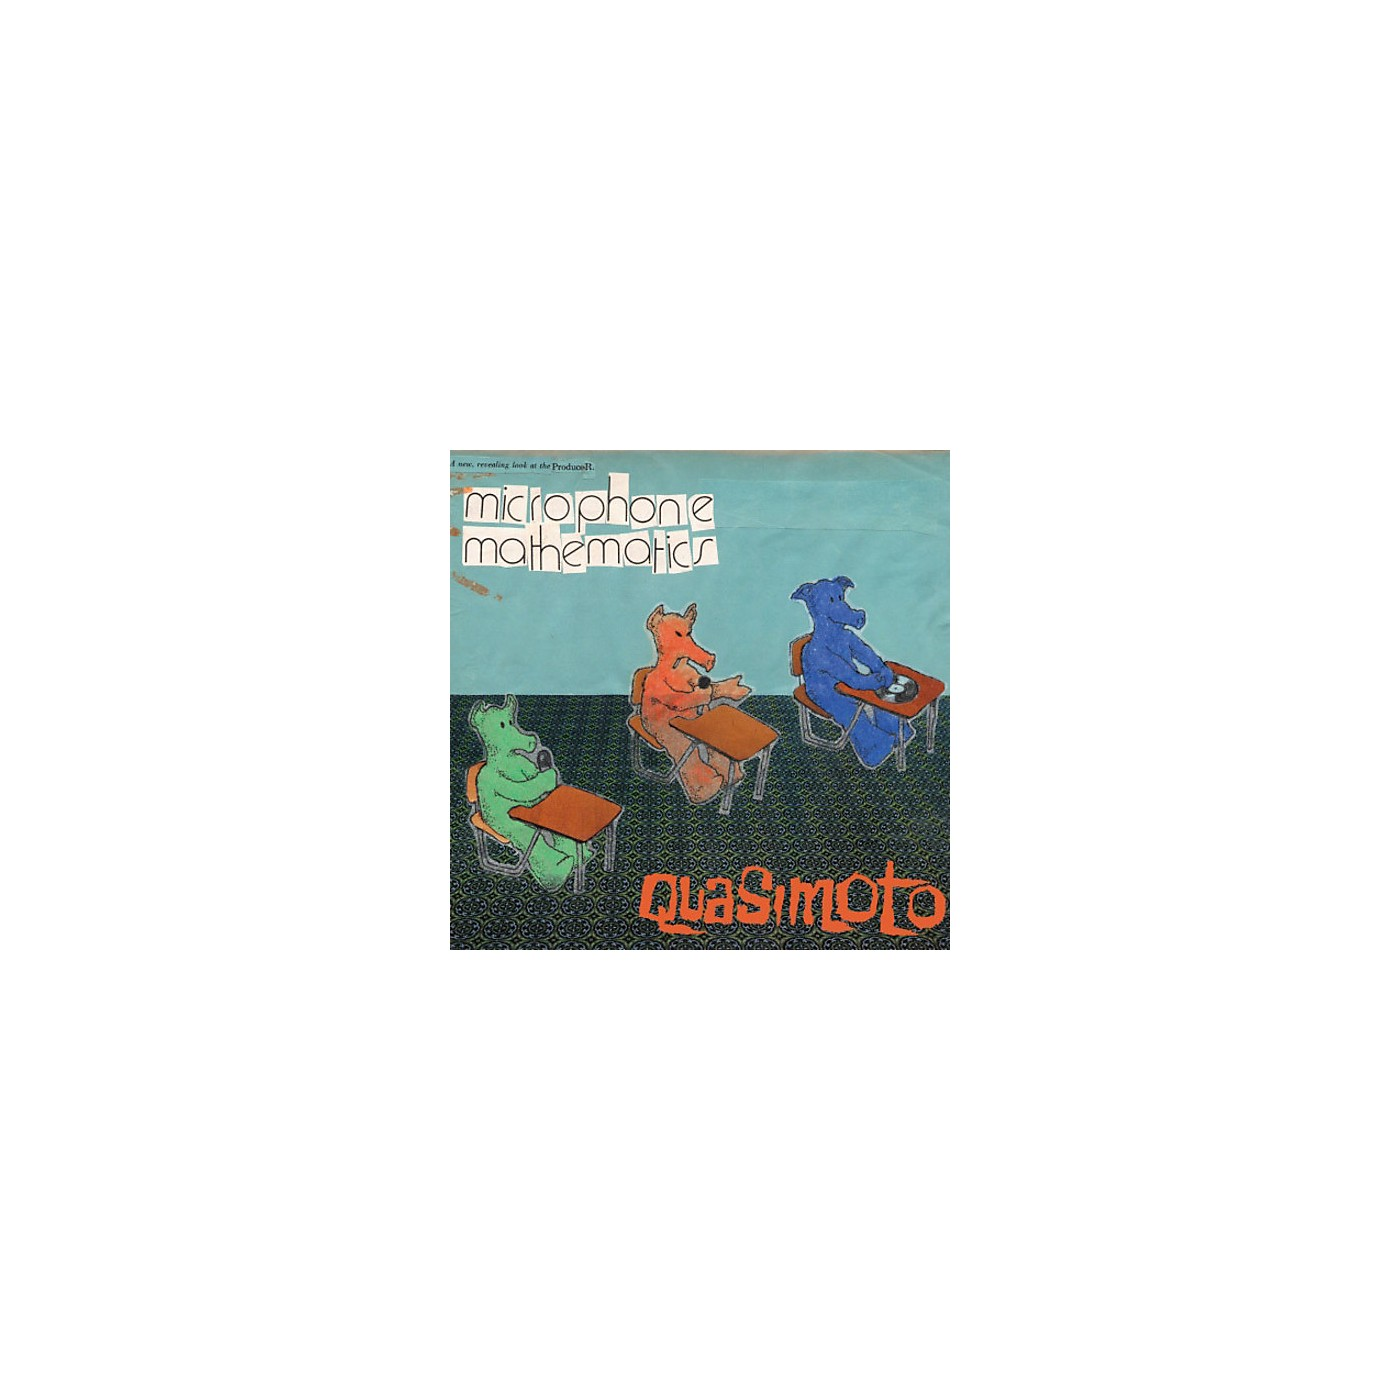 Alliance Quasimoto - Microphone Mathematics thumbnail